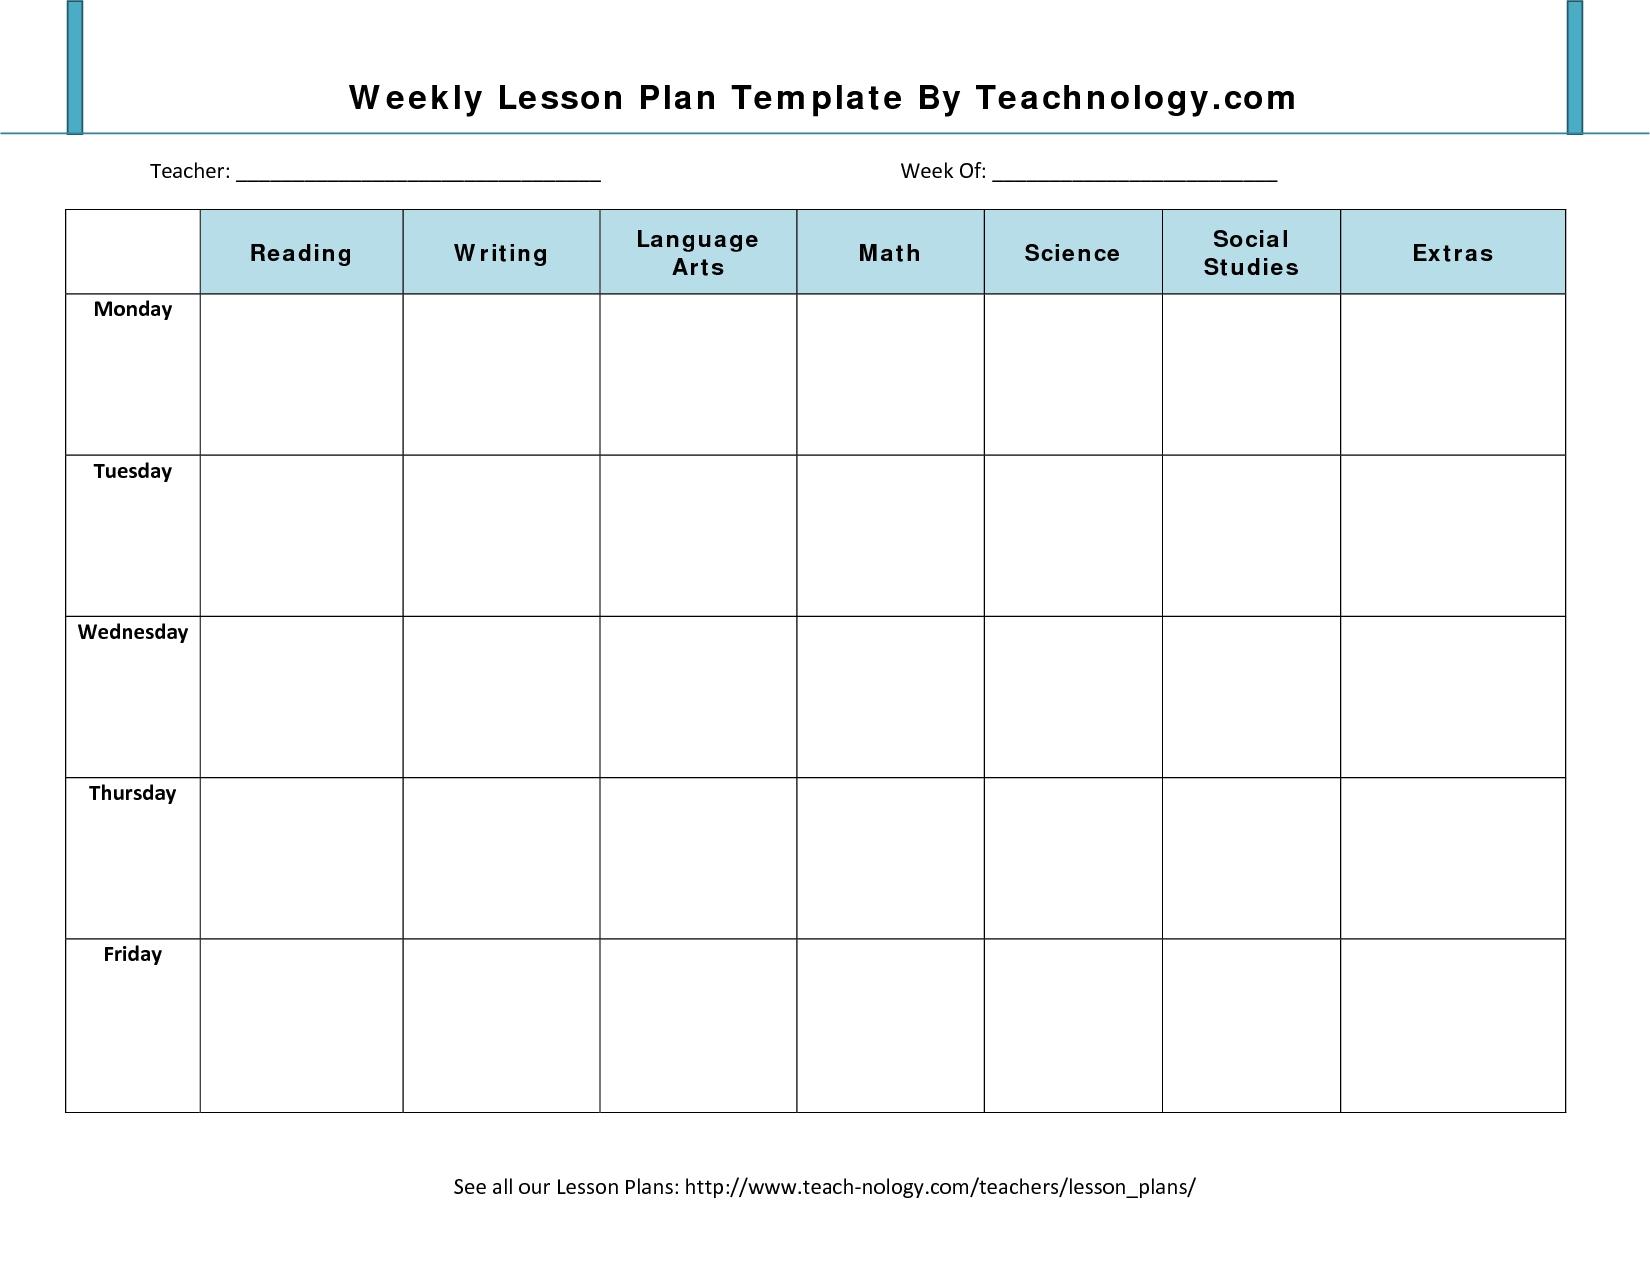 Weekly Calendar Lesson Plan Template   Jazz Gear regarding Weekly Calander Lesson Plan Template